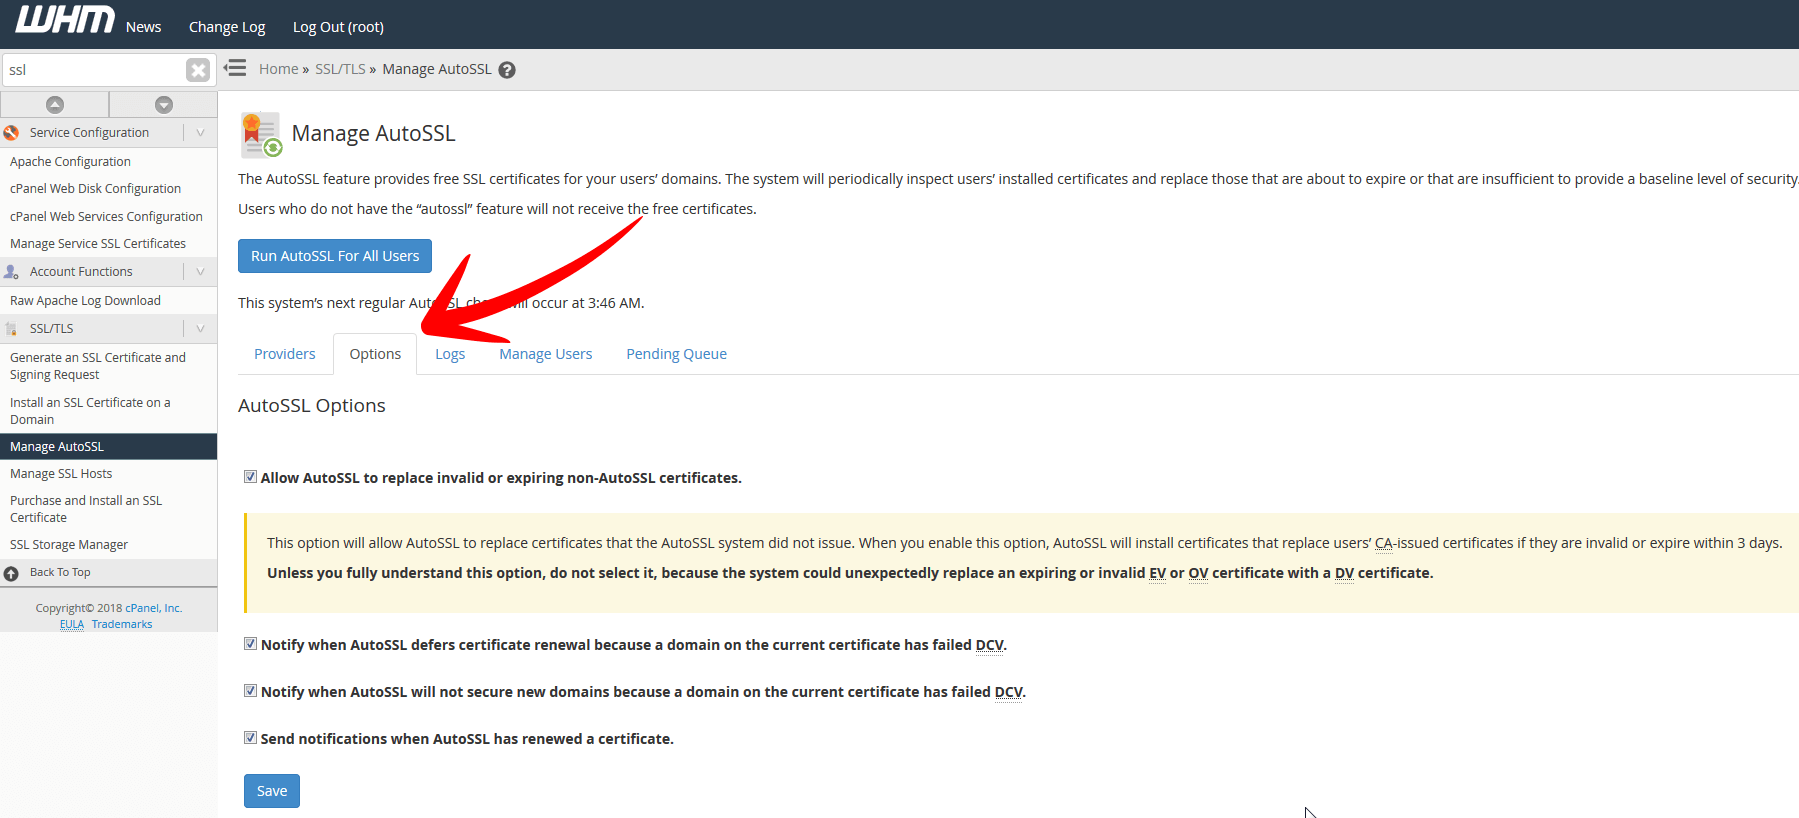 Manage AutoSSL Options